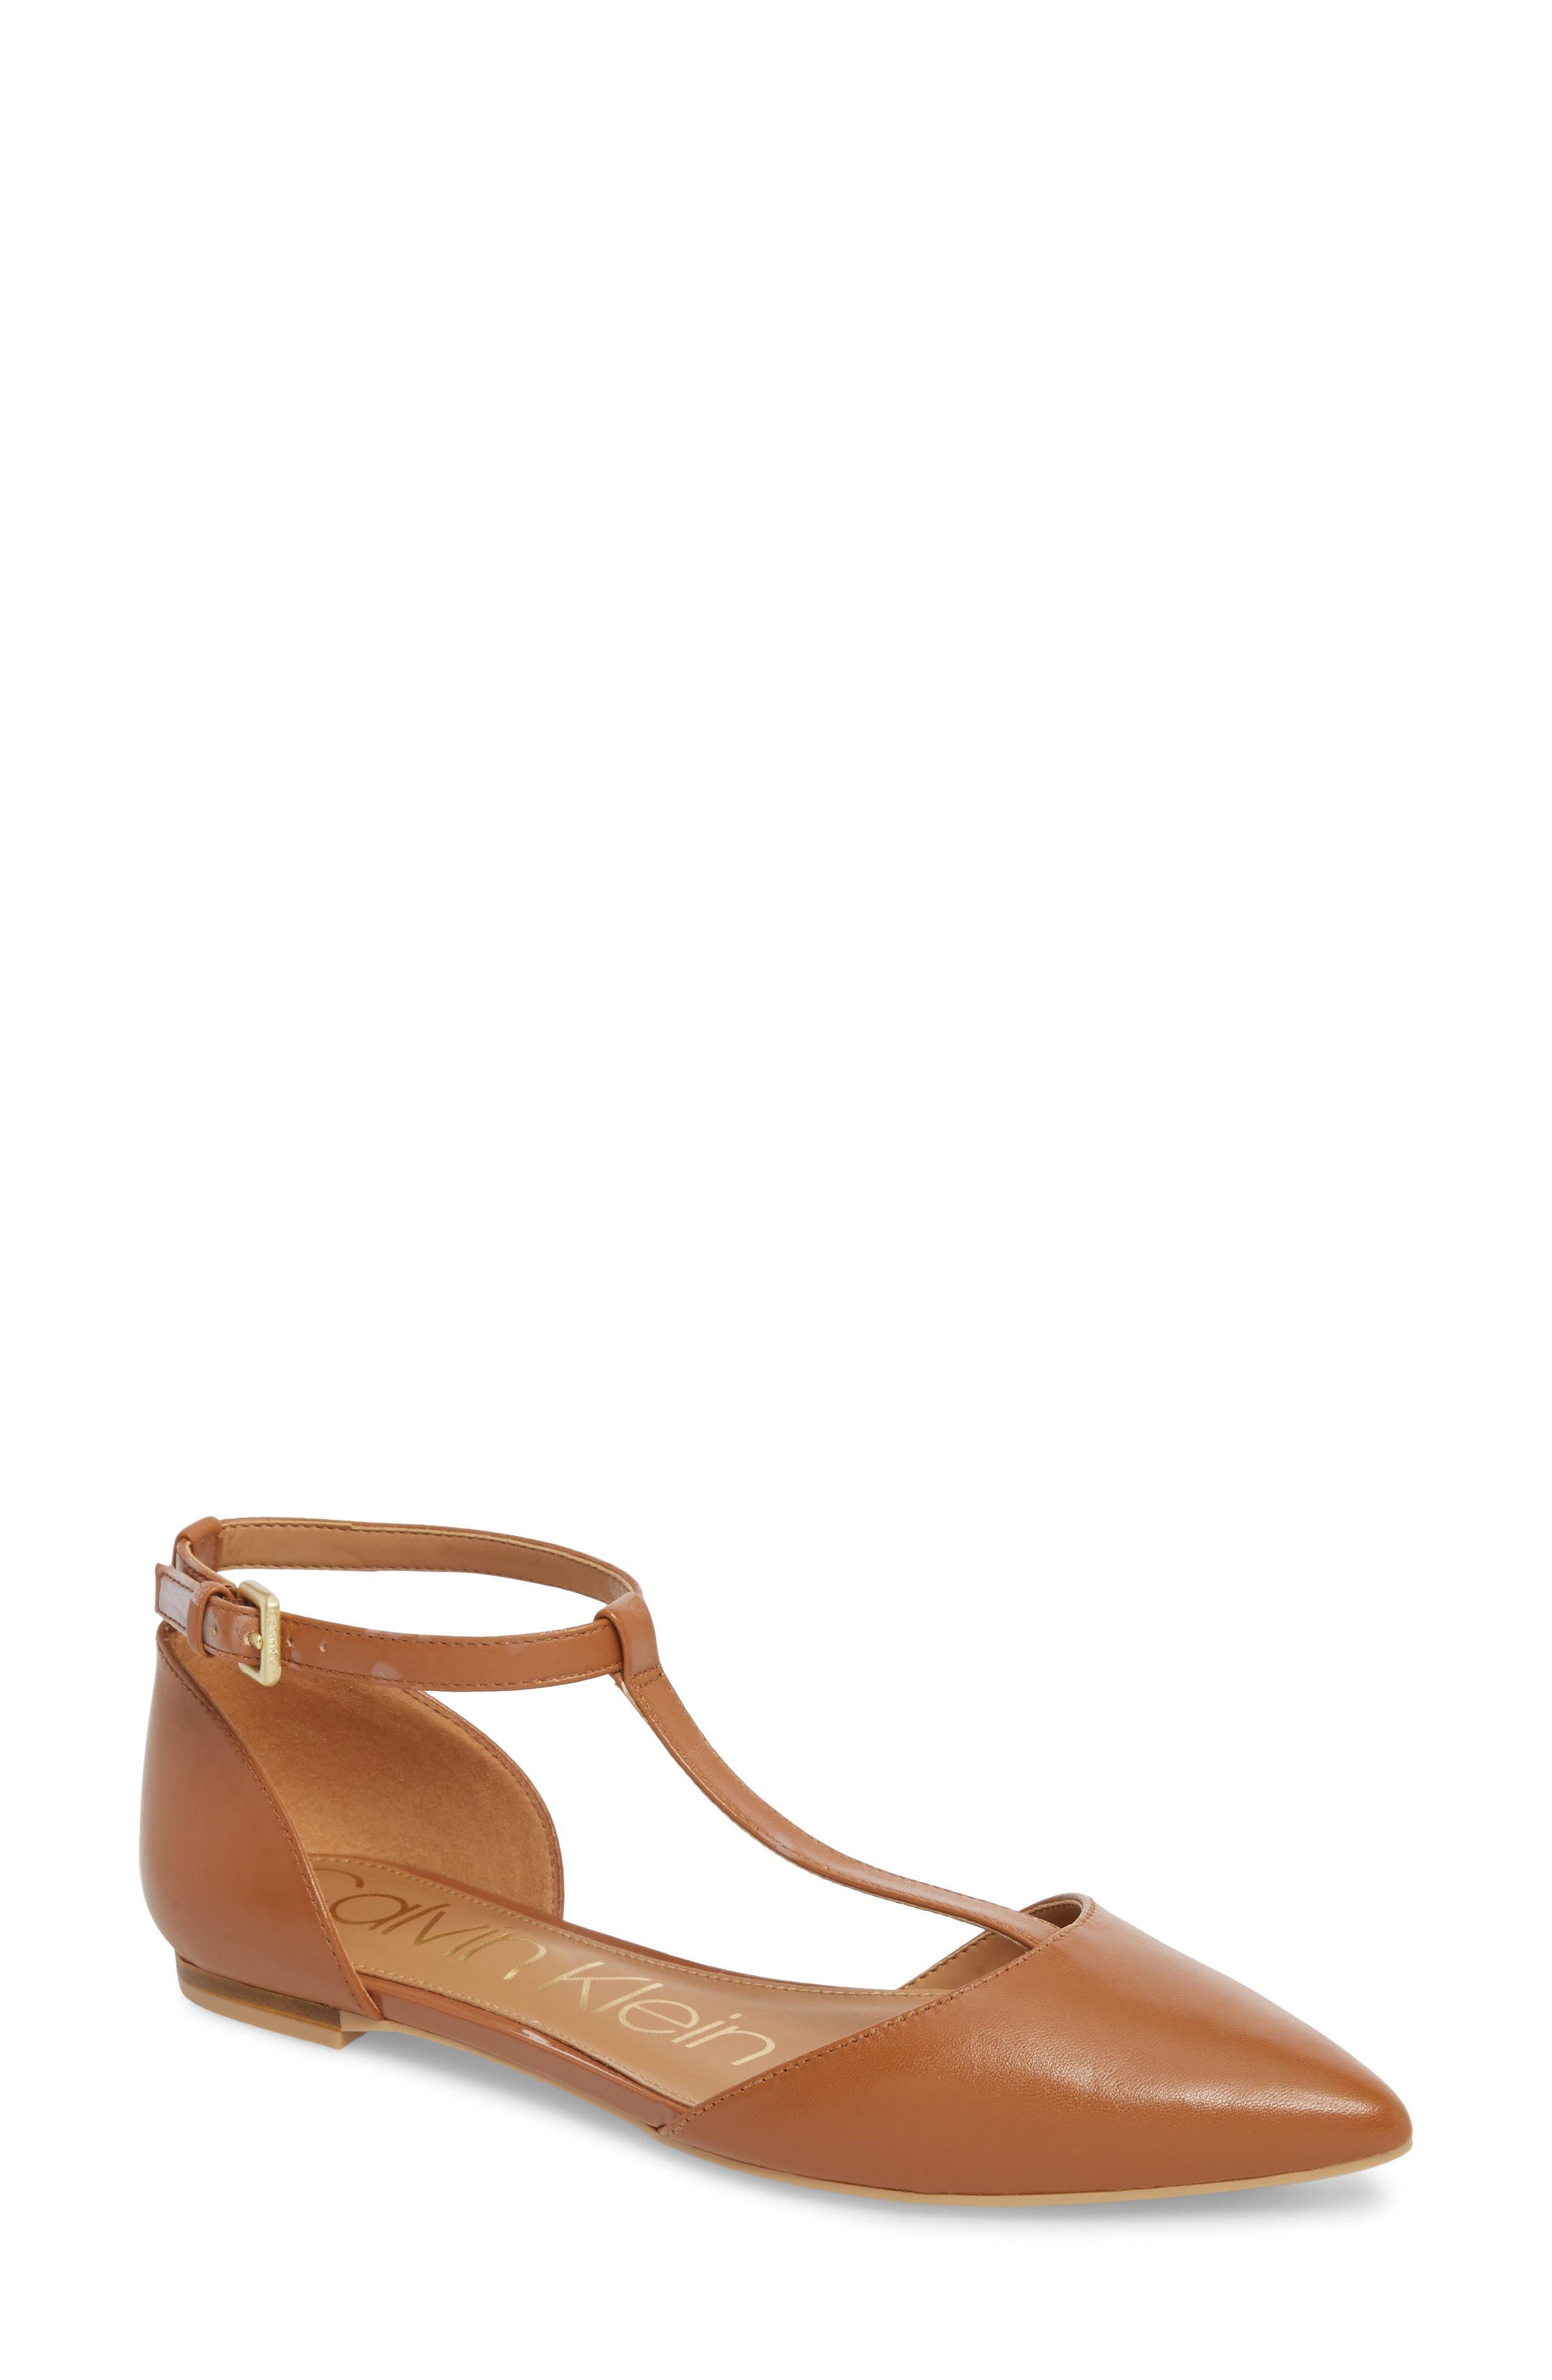 Calvin Klein Shoes Sale \u0026 Clearance